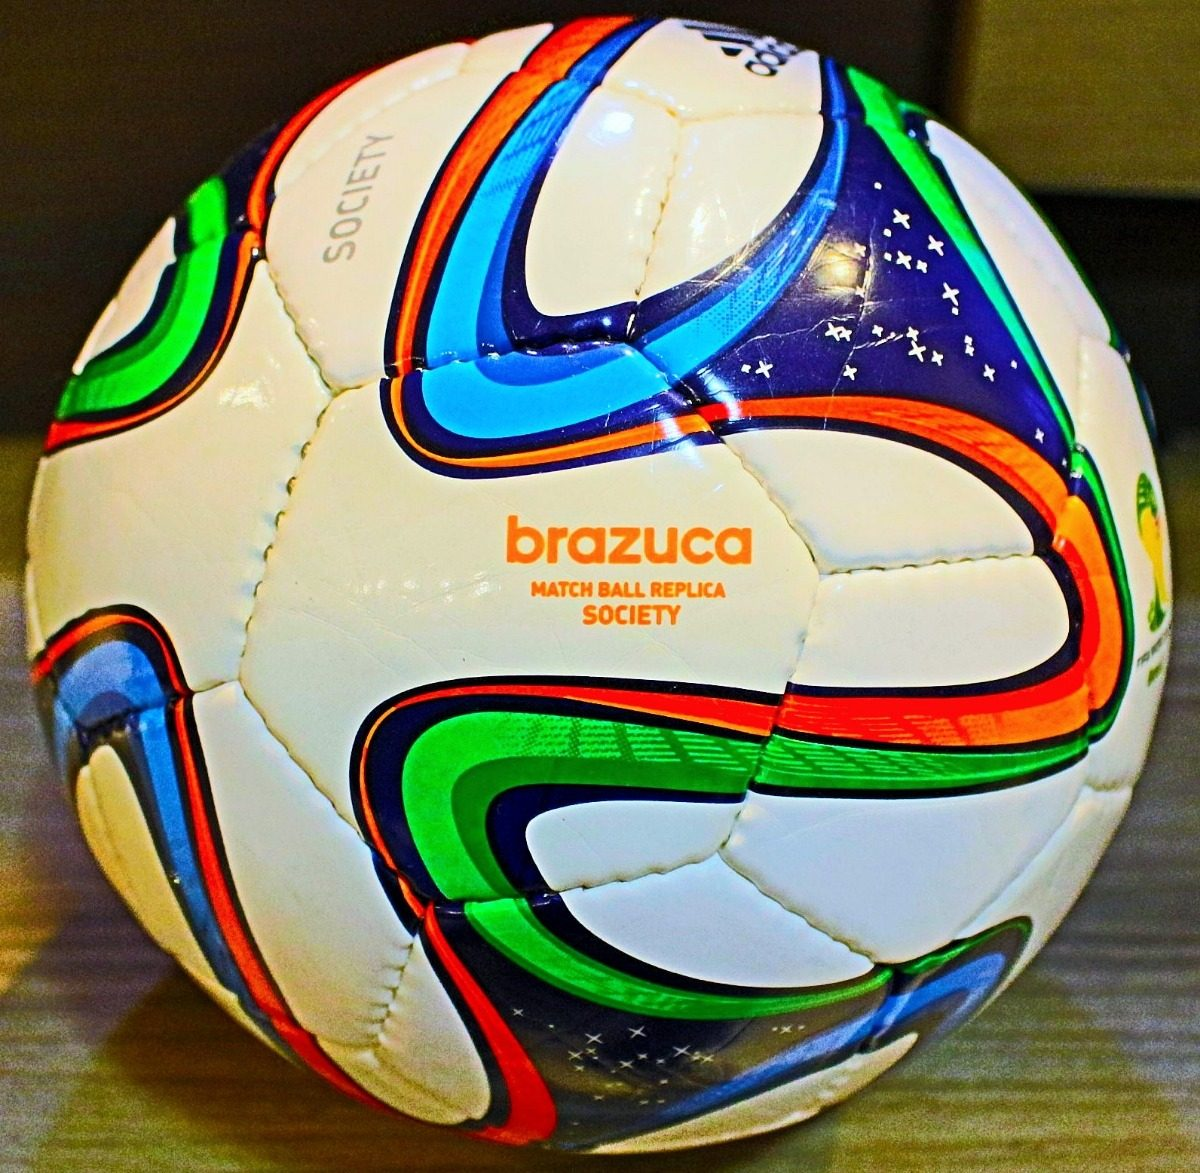 1e2fa9d594 rara bola adidas brazuca society câmara e bico novos. Carregando zoom.